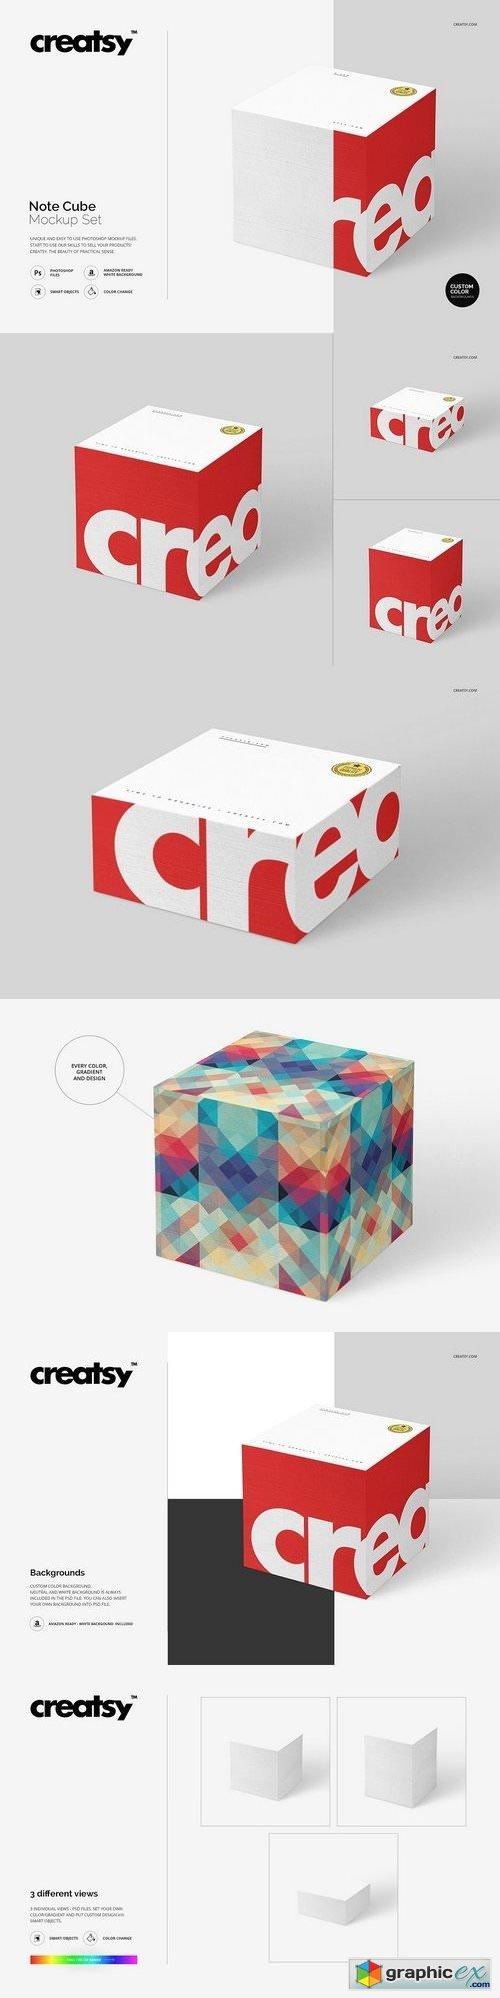 Note Cube Mockup Set